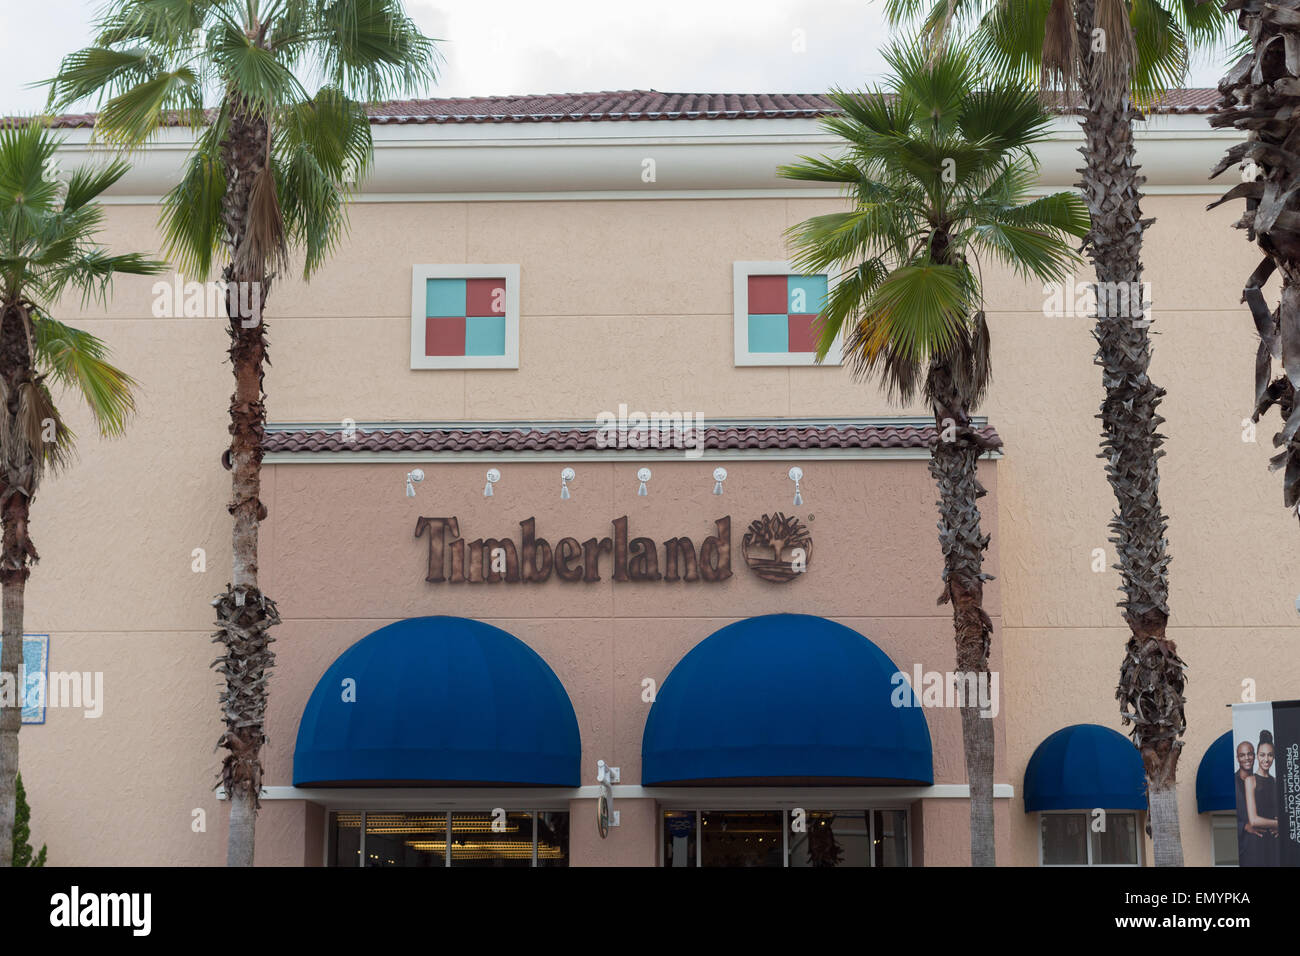 Timberland at Orlando Premium Outlet Shopping Mall at